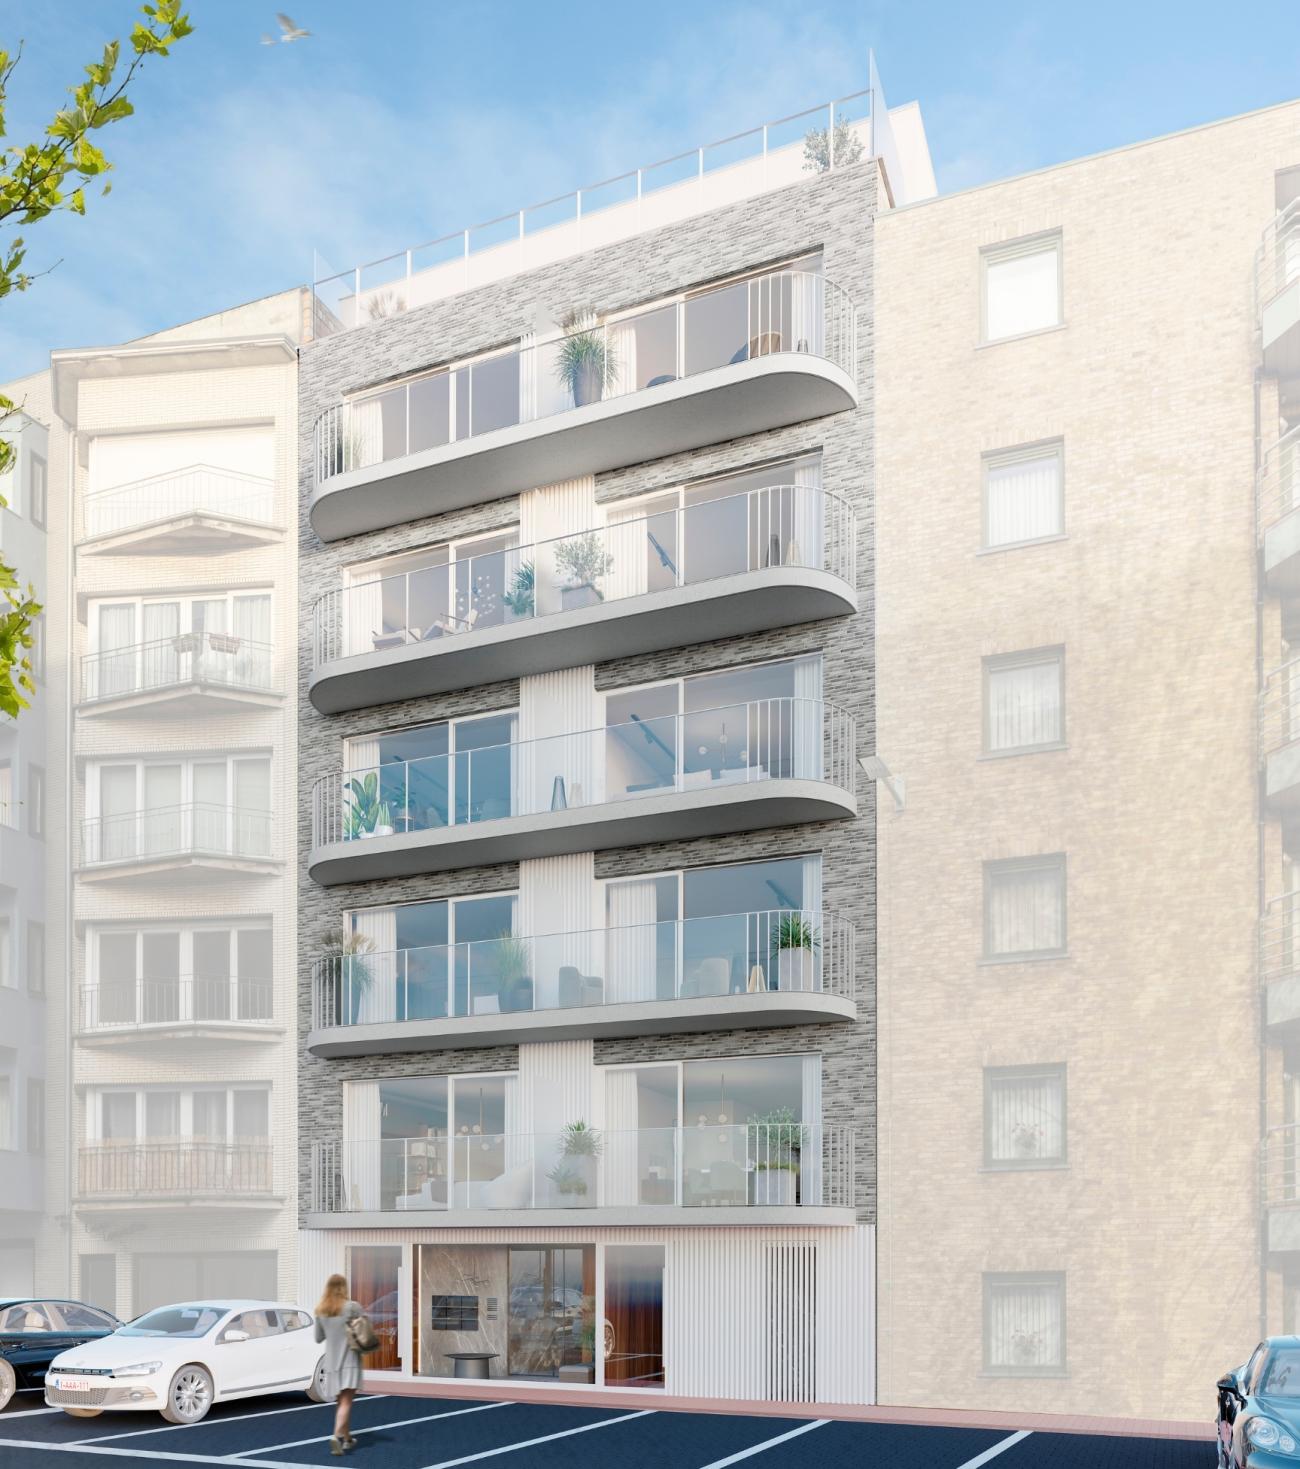 Residentie <br/> De Baak ll - image appartement-te-koop-koksijde-residentie-de-baak-2-buitenkant on https://hoprom.be